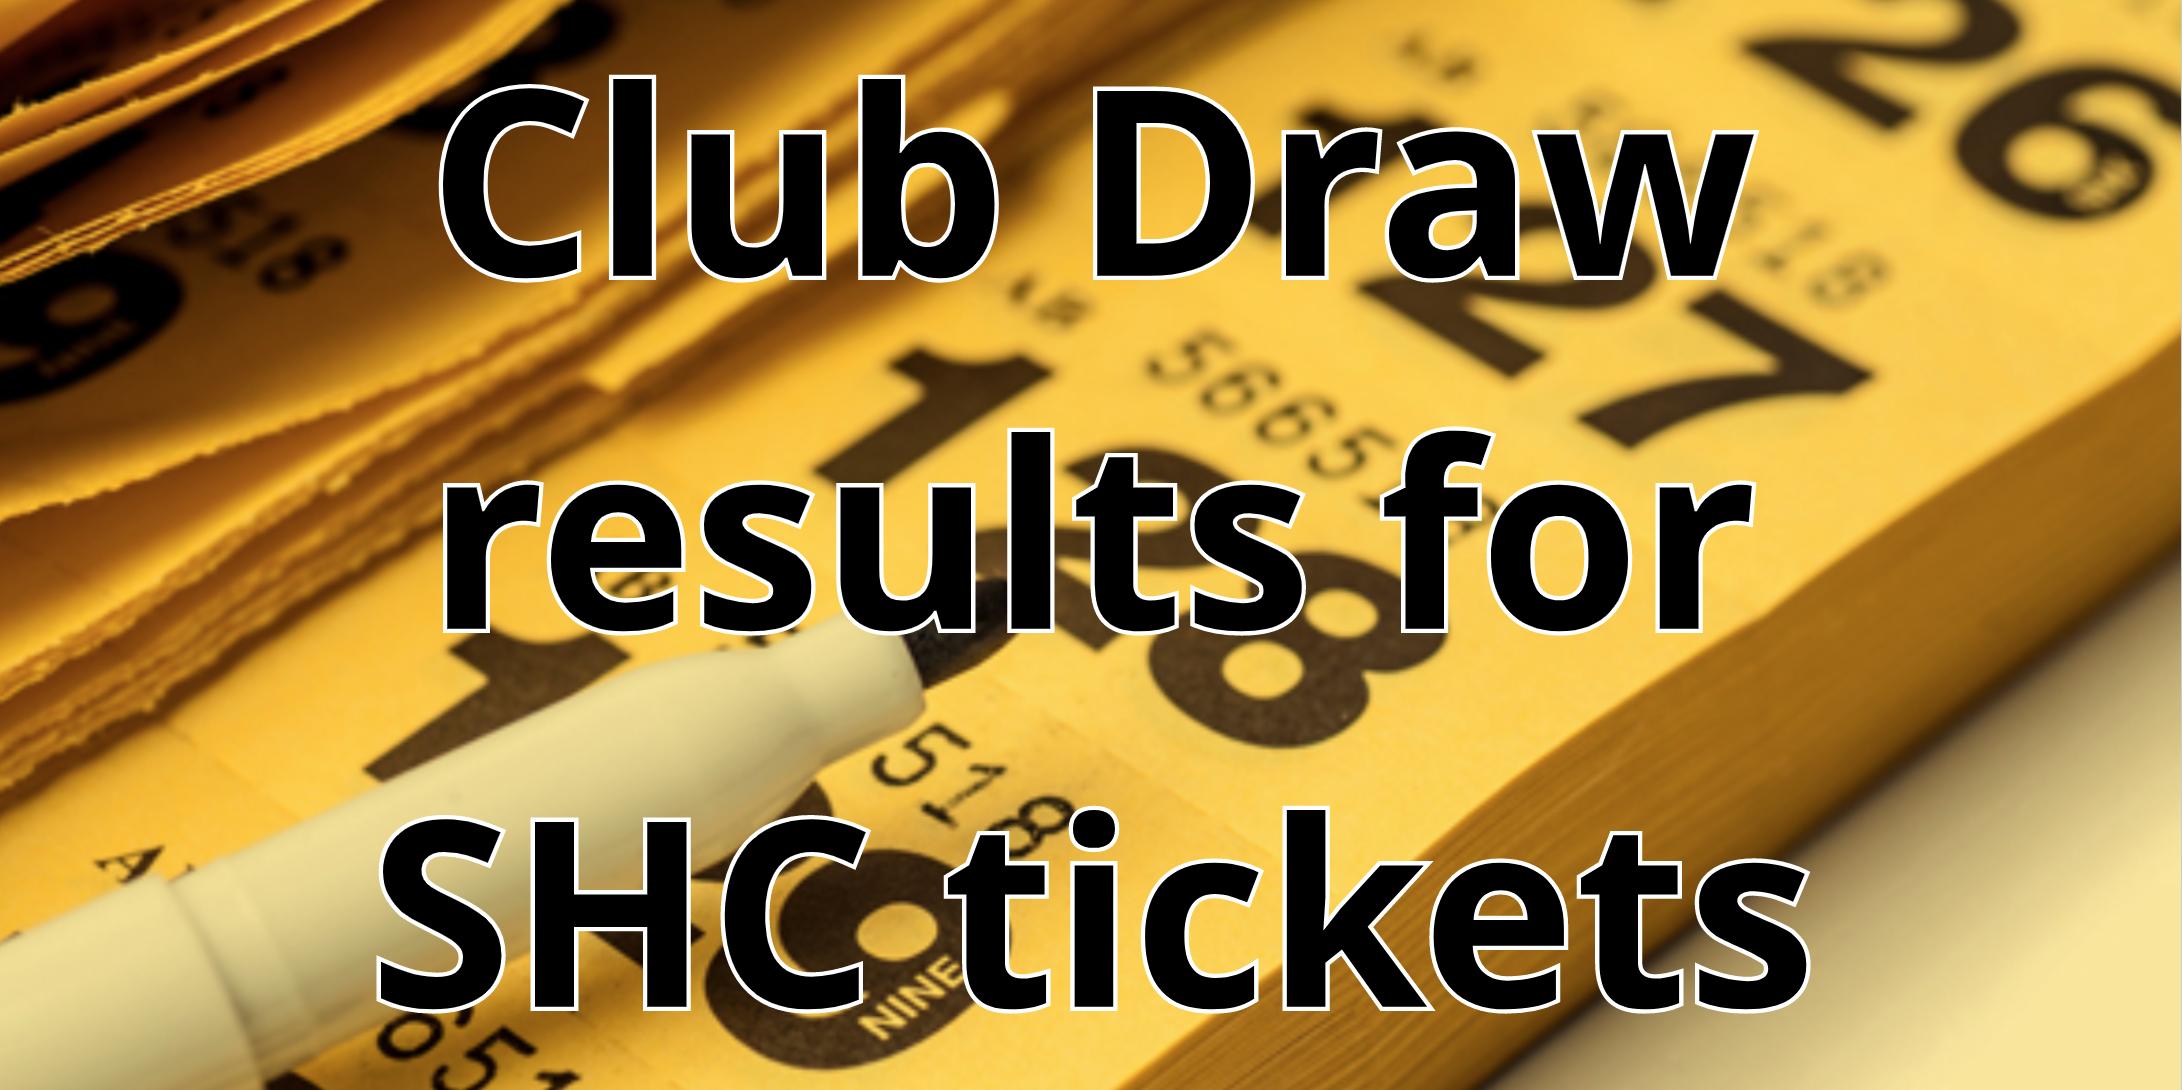 Down GAA SHC Club ticket allocation list and arrangements